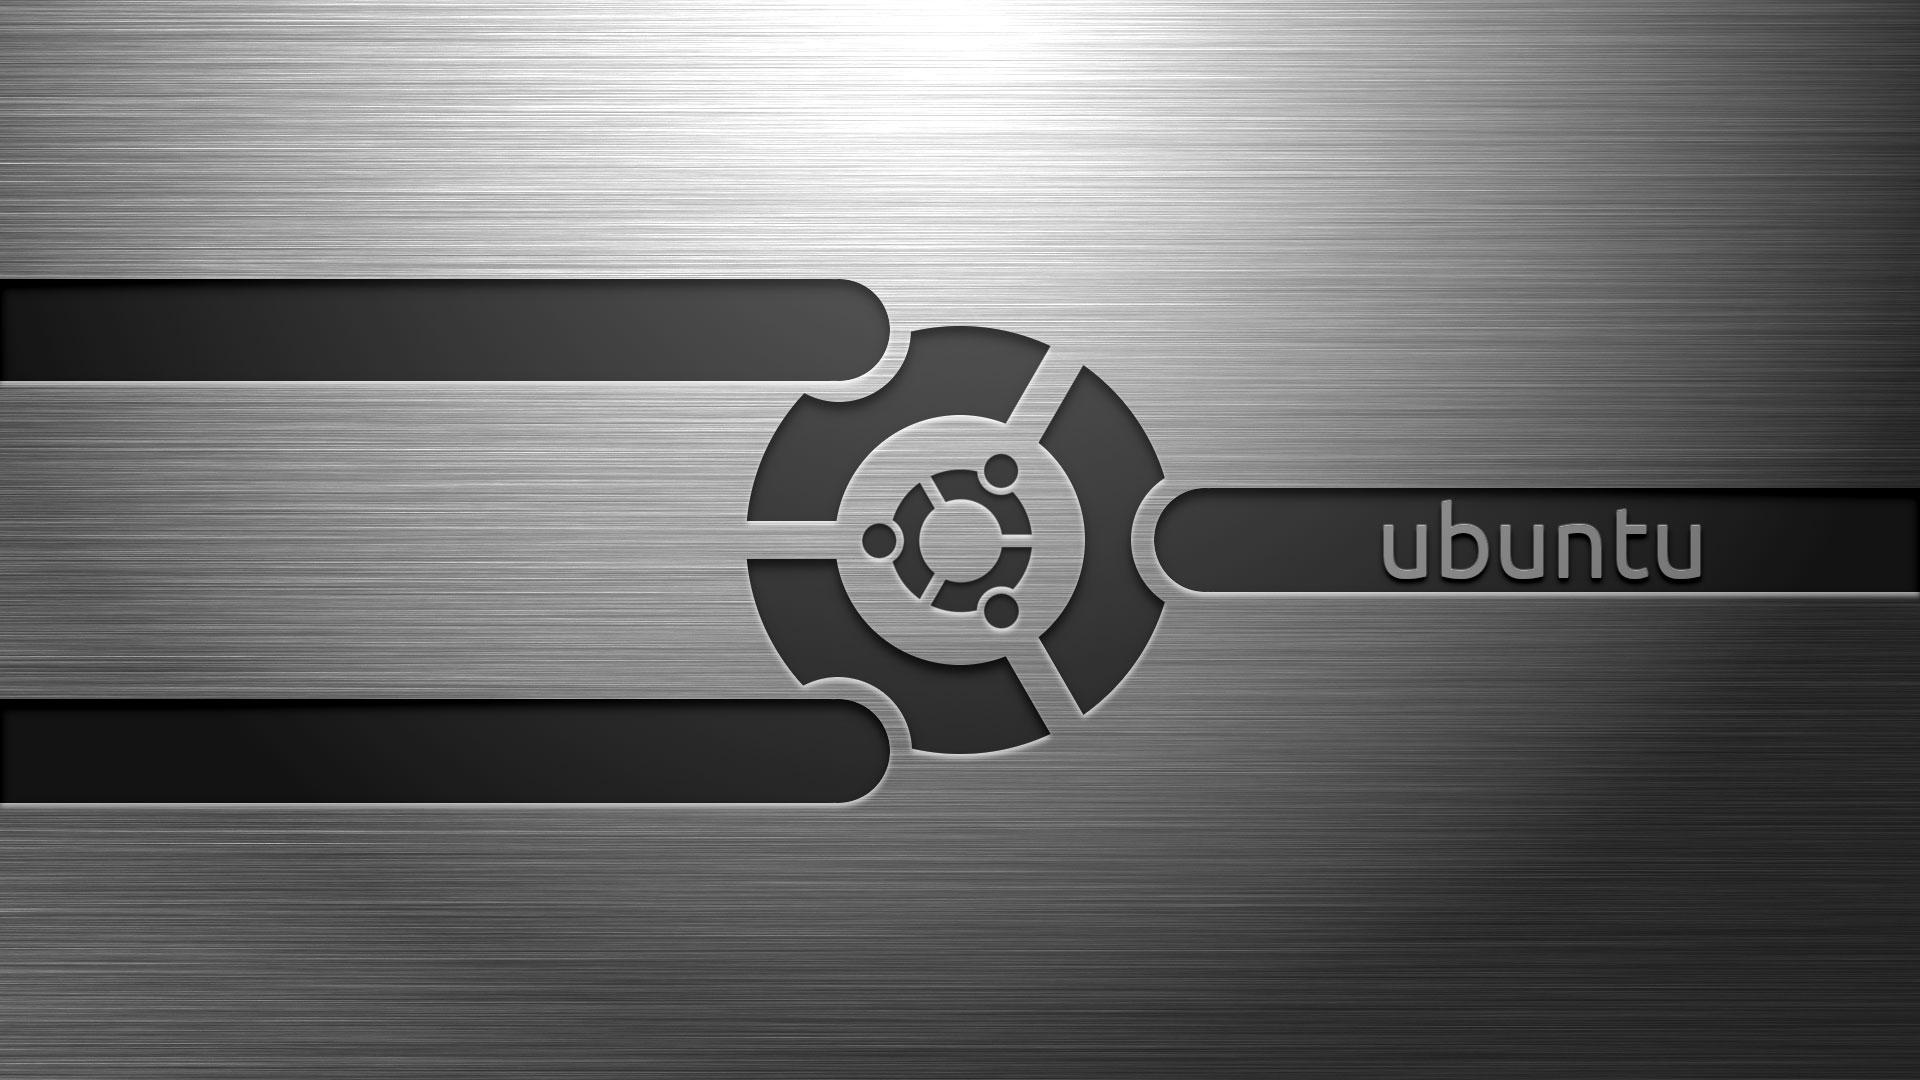 Ubuntu Logo Wallpaper 40660 1600x1200 px